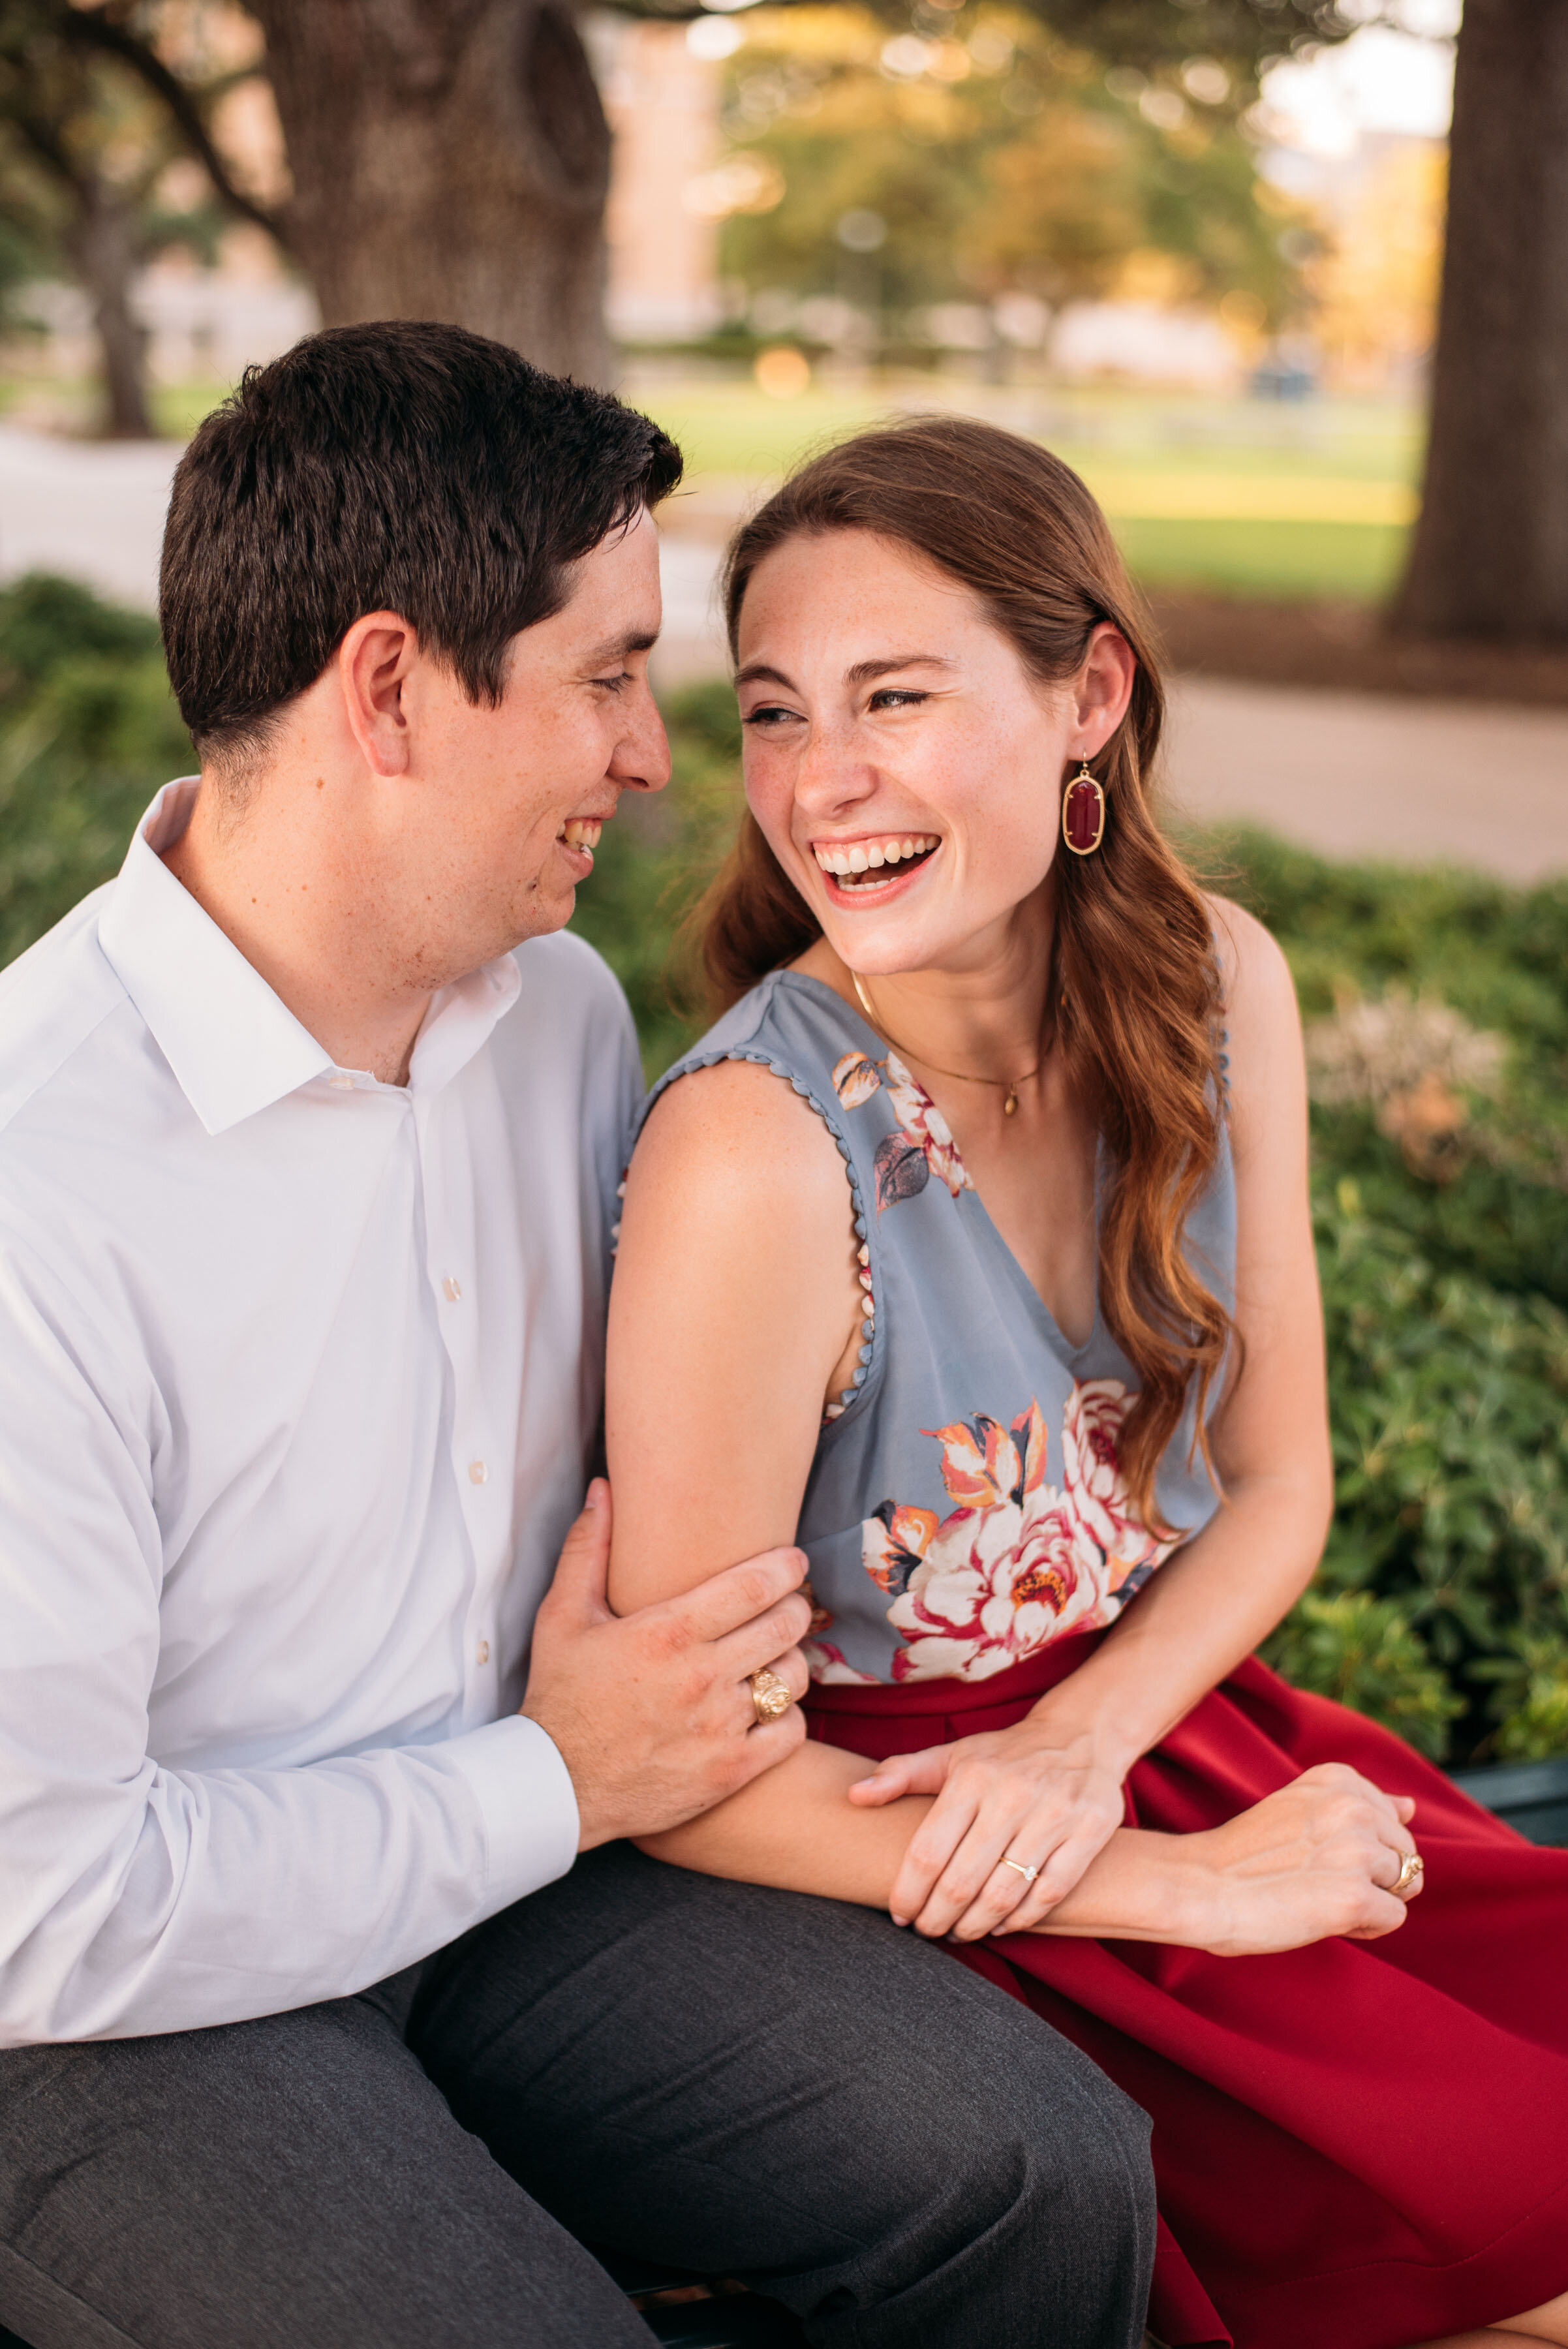 Texas-A&M-University-Engagement-Session-Century-Tree-Military-Walk-College-Station-Wedding-Photographer-San-Angel-Photo-Tony-Kate-21.jpg